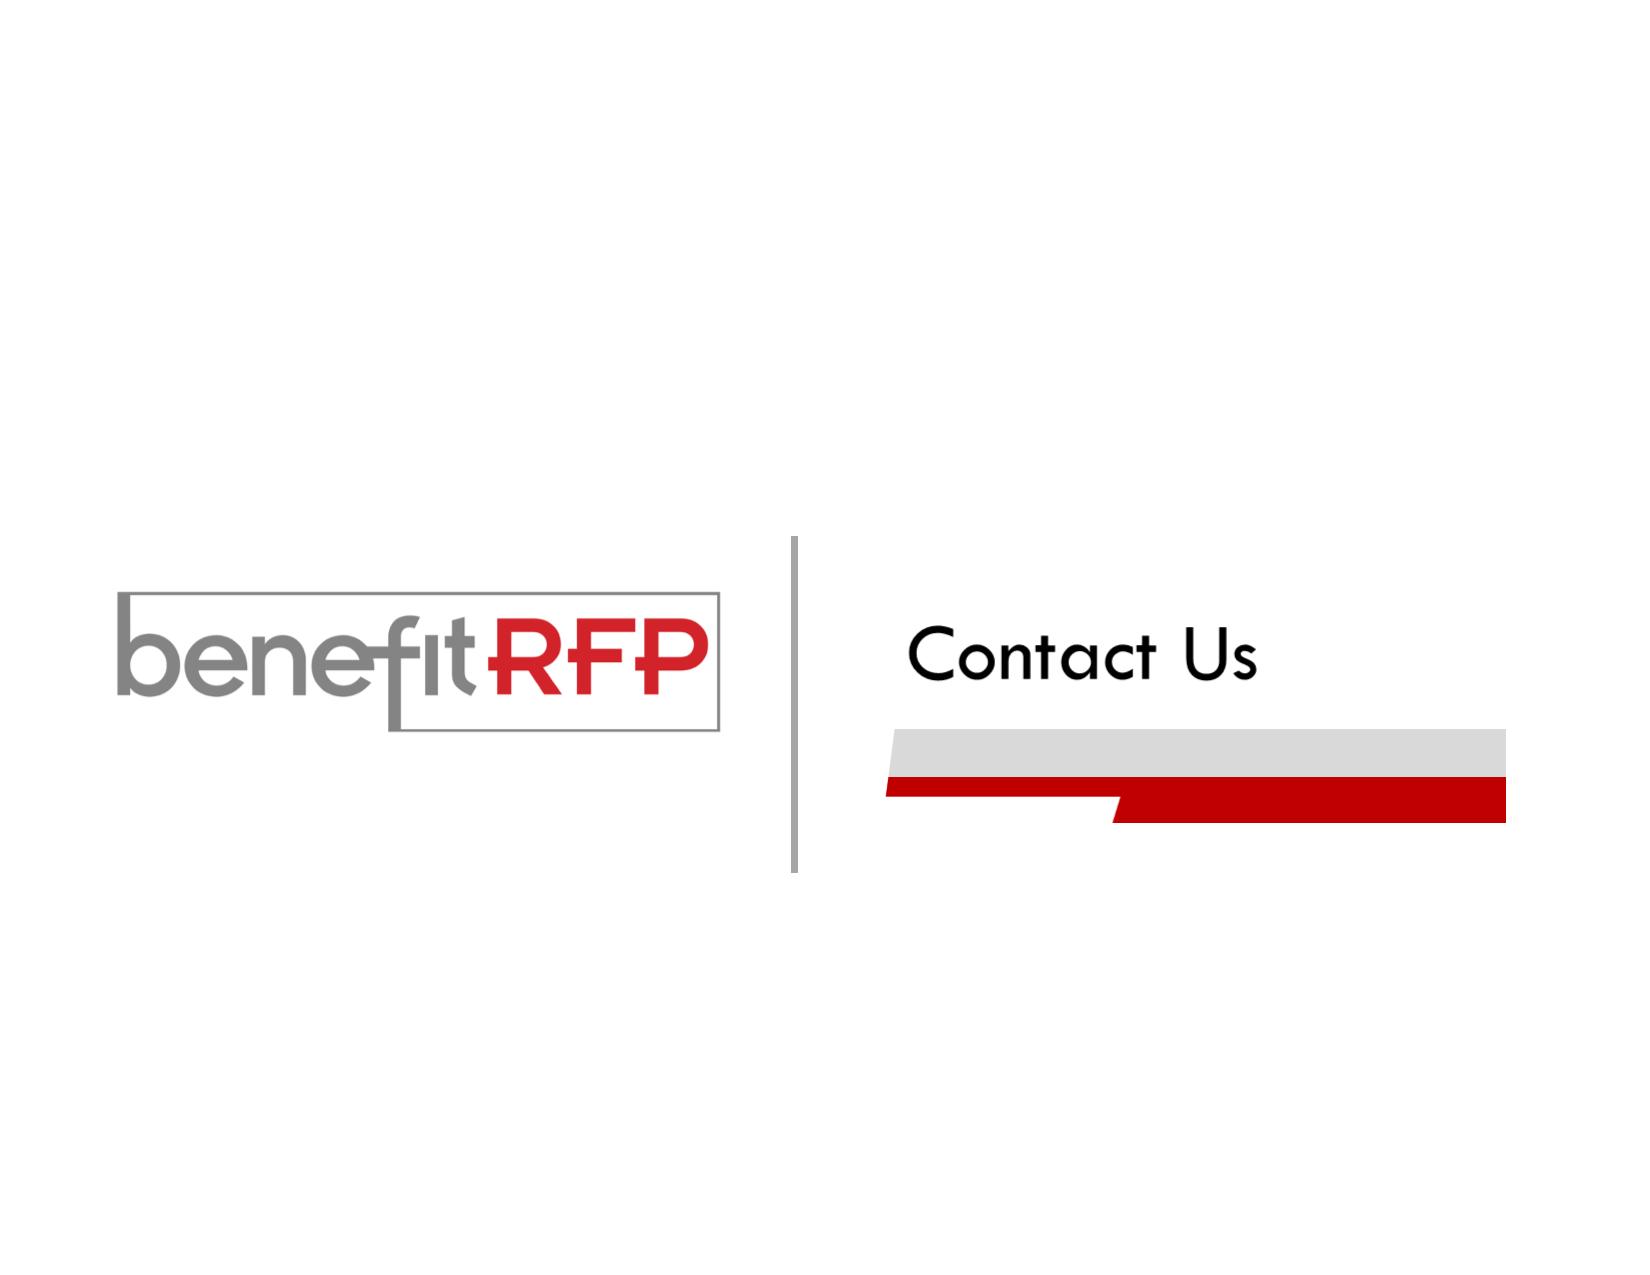 website banner contact us.png